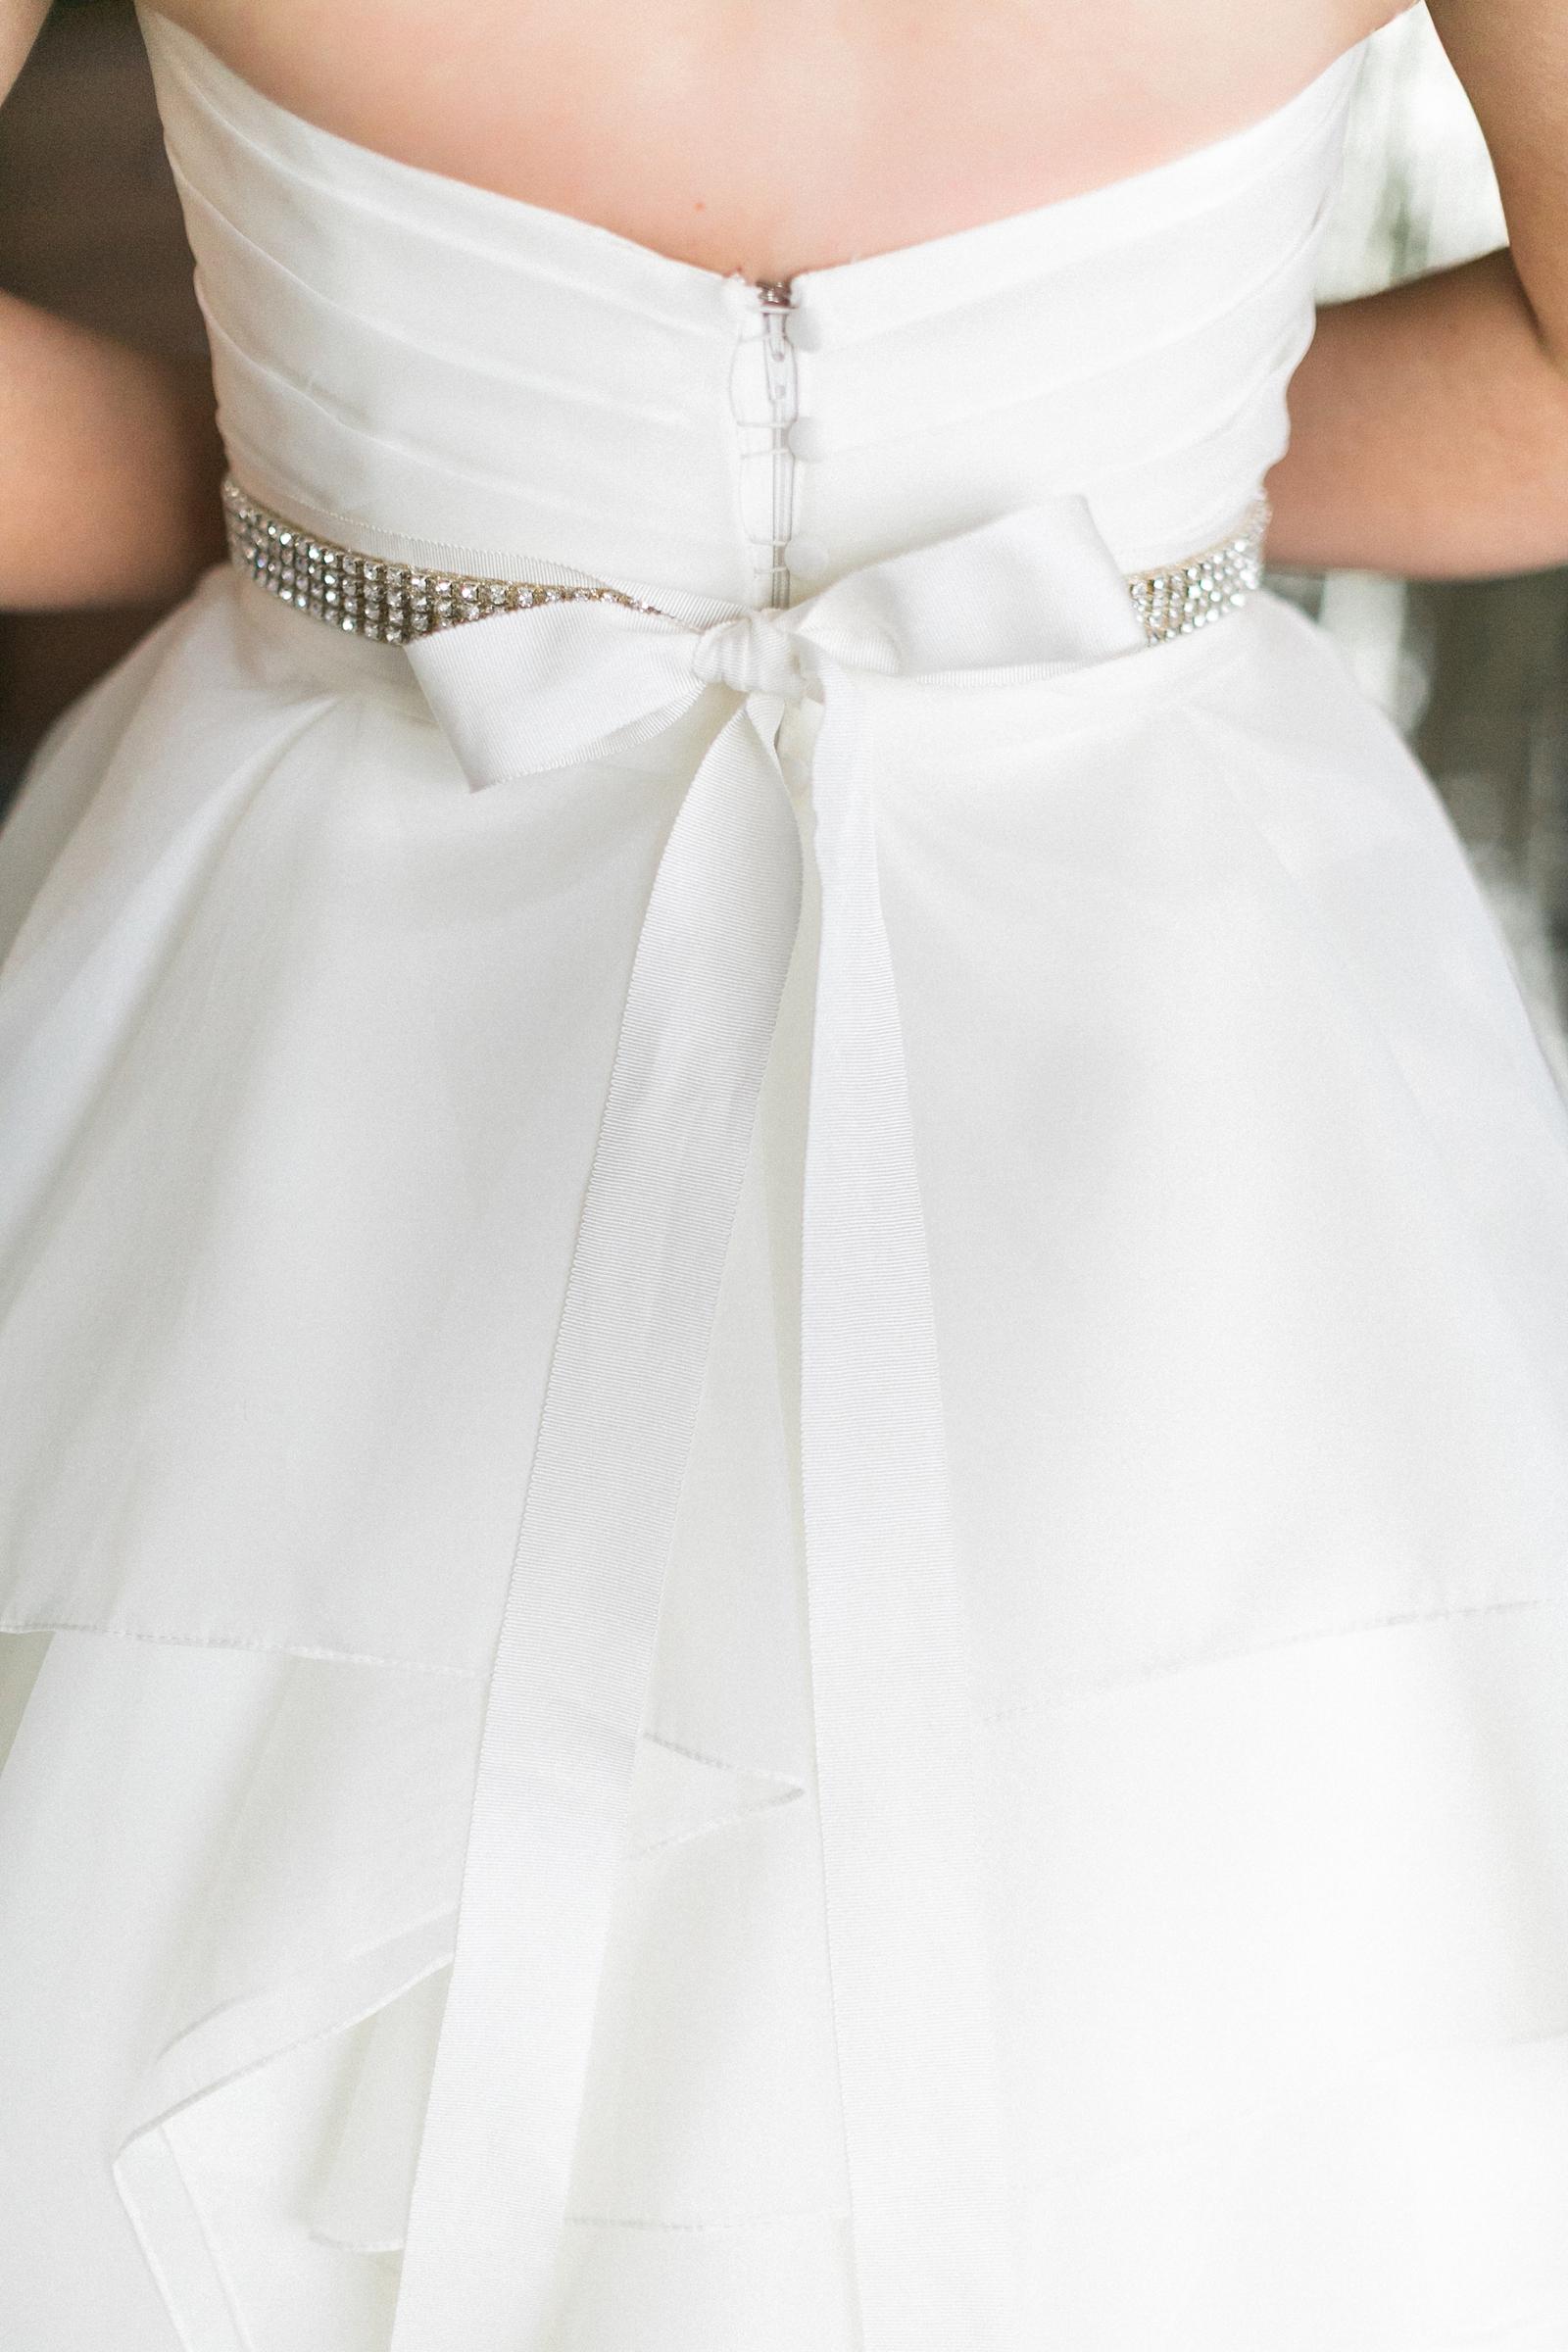 Knoxville-Wedding-Photographer_0014.jpg